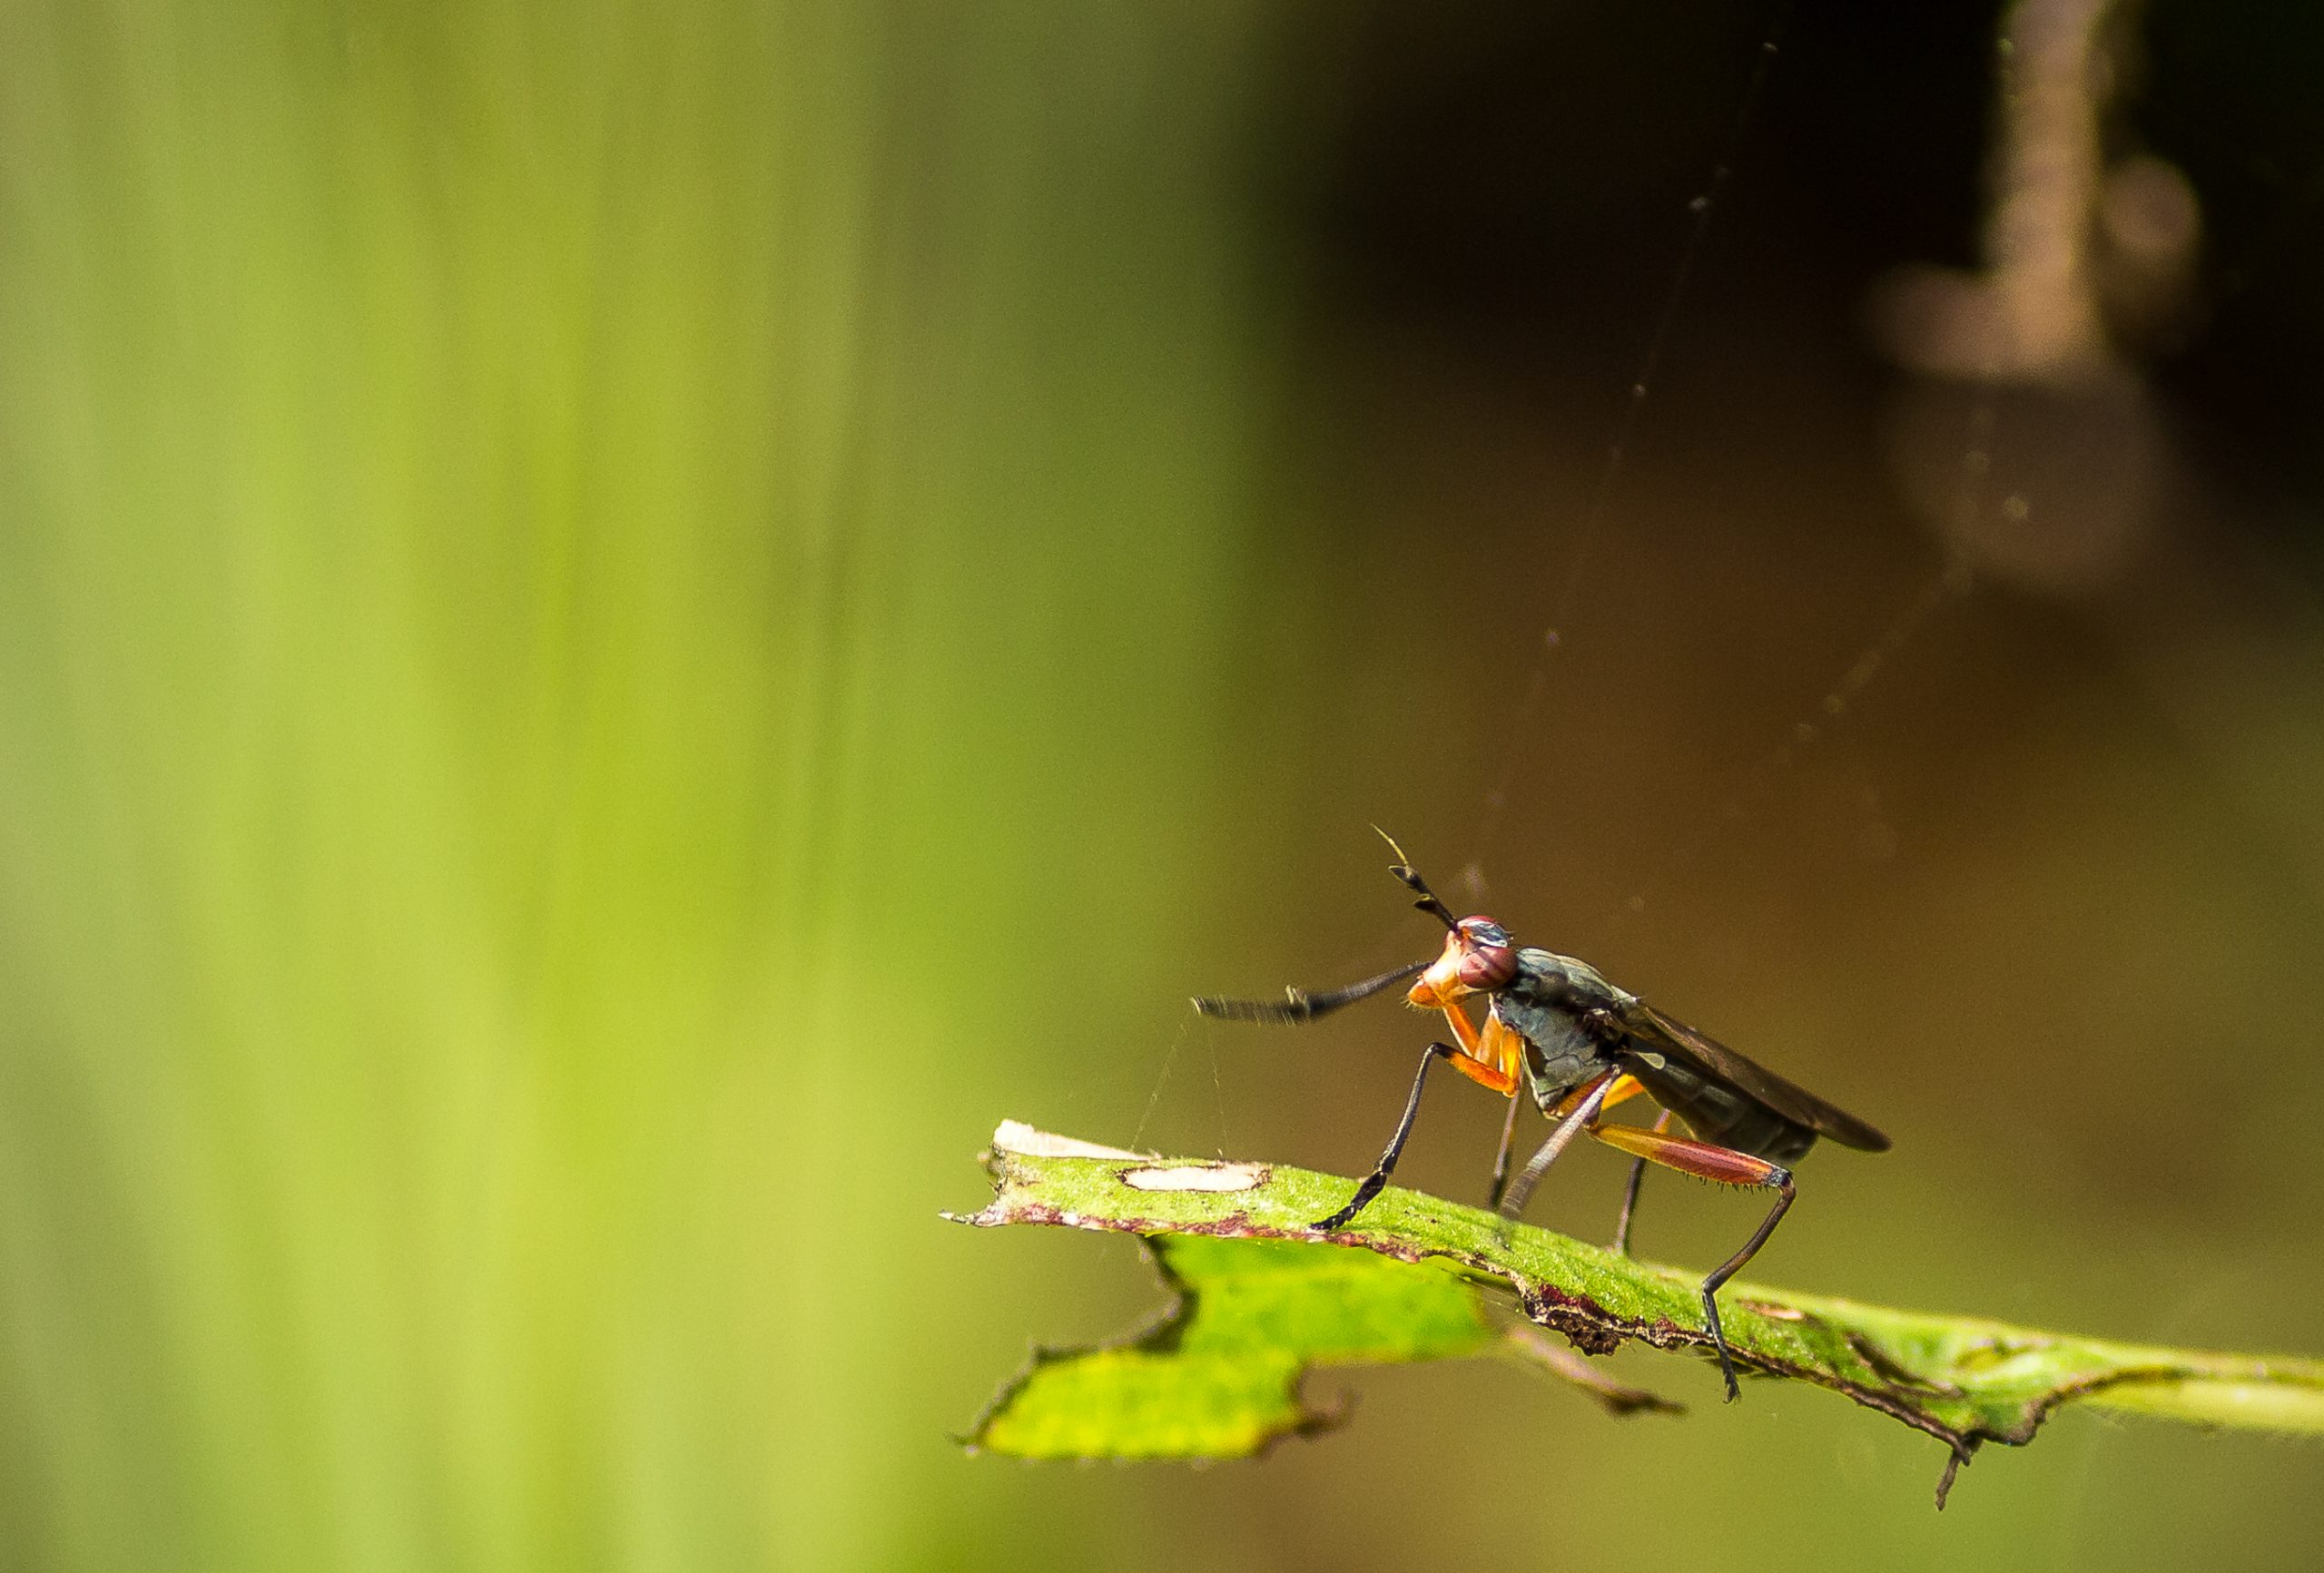 Bug on the plant leaf